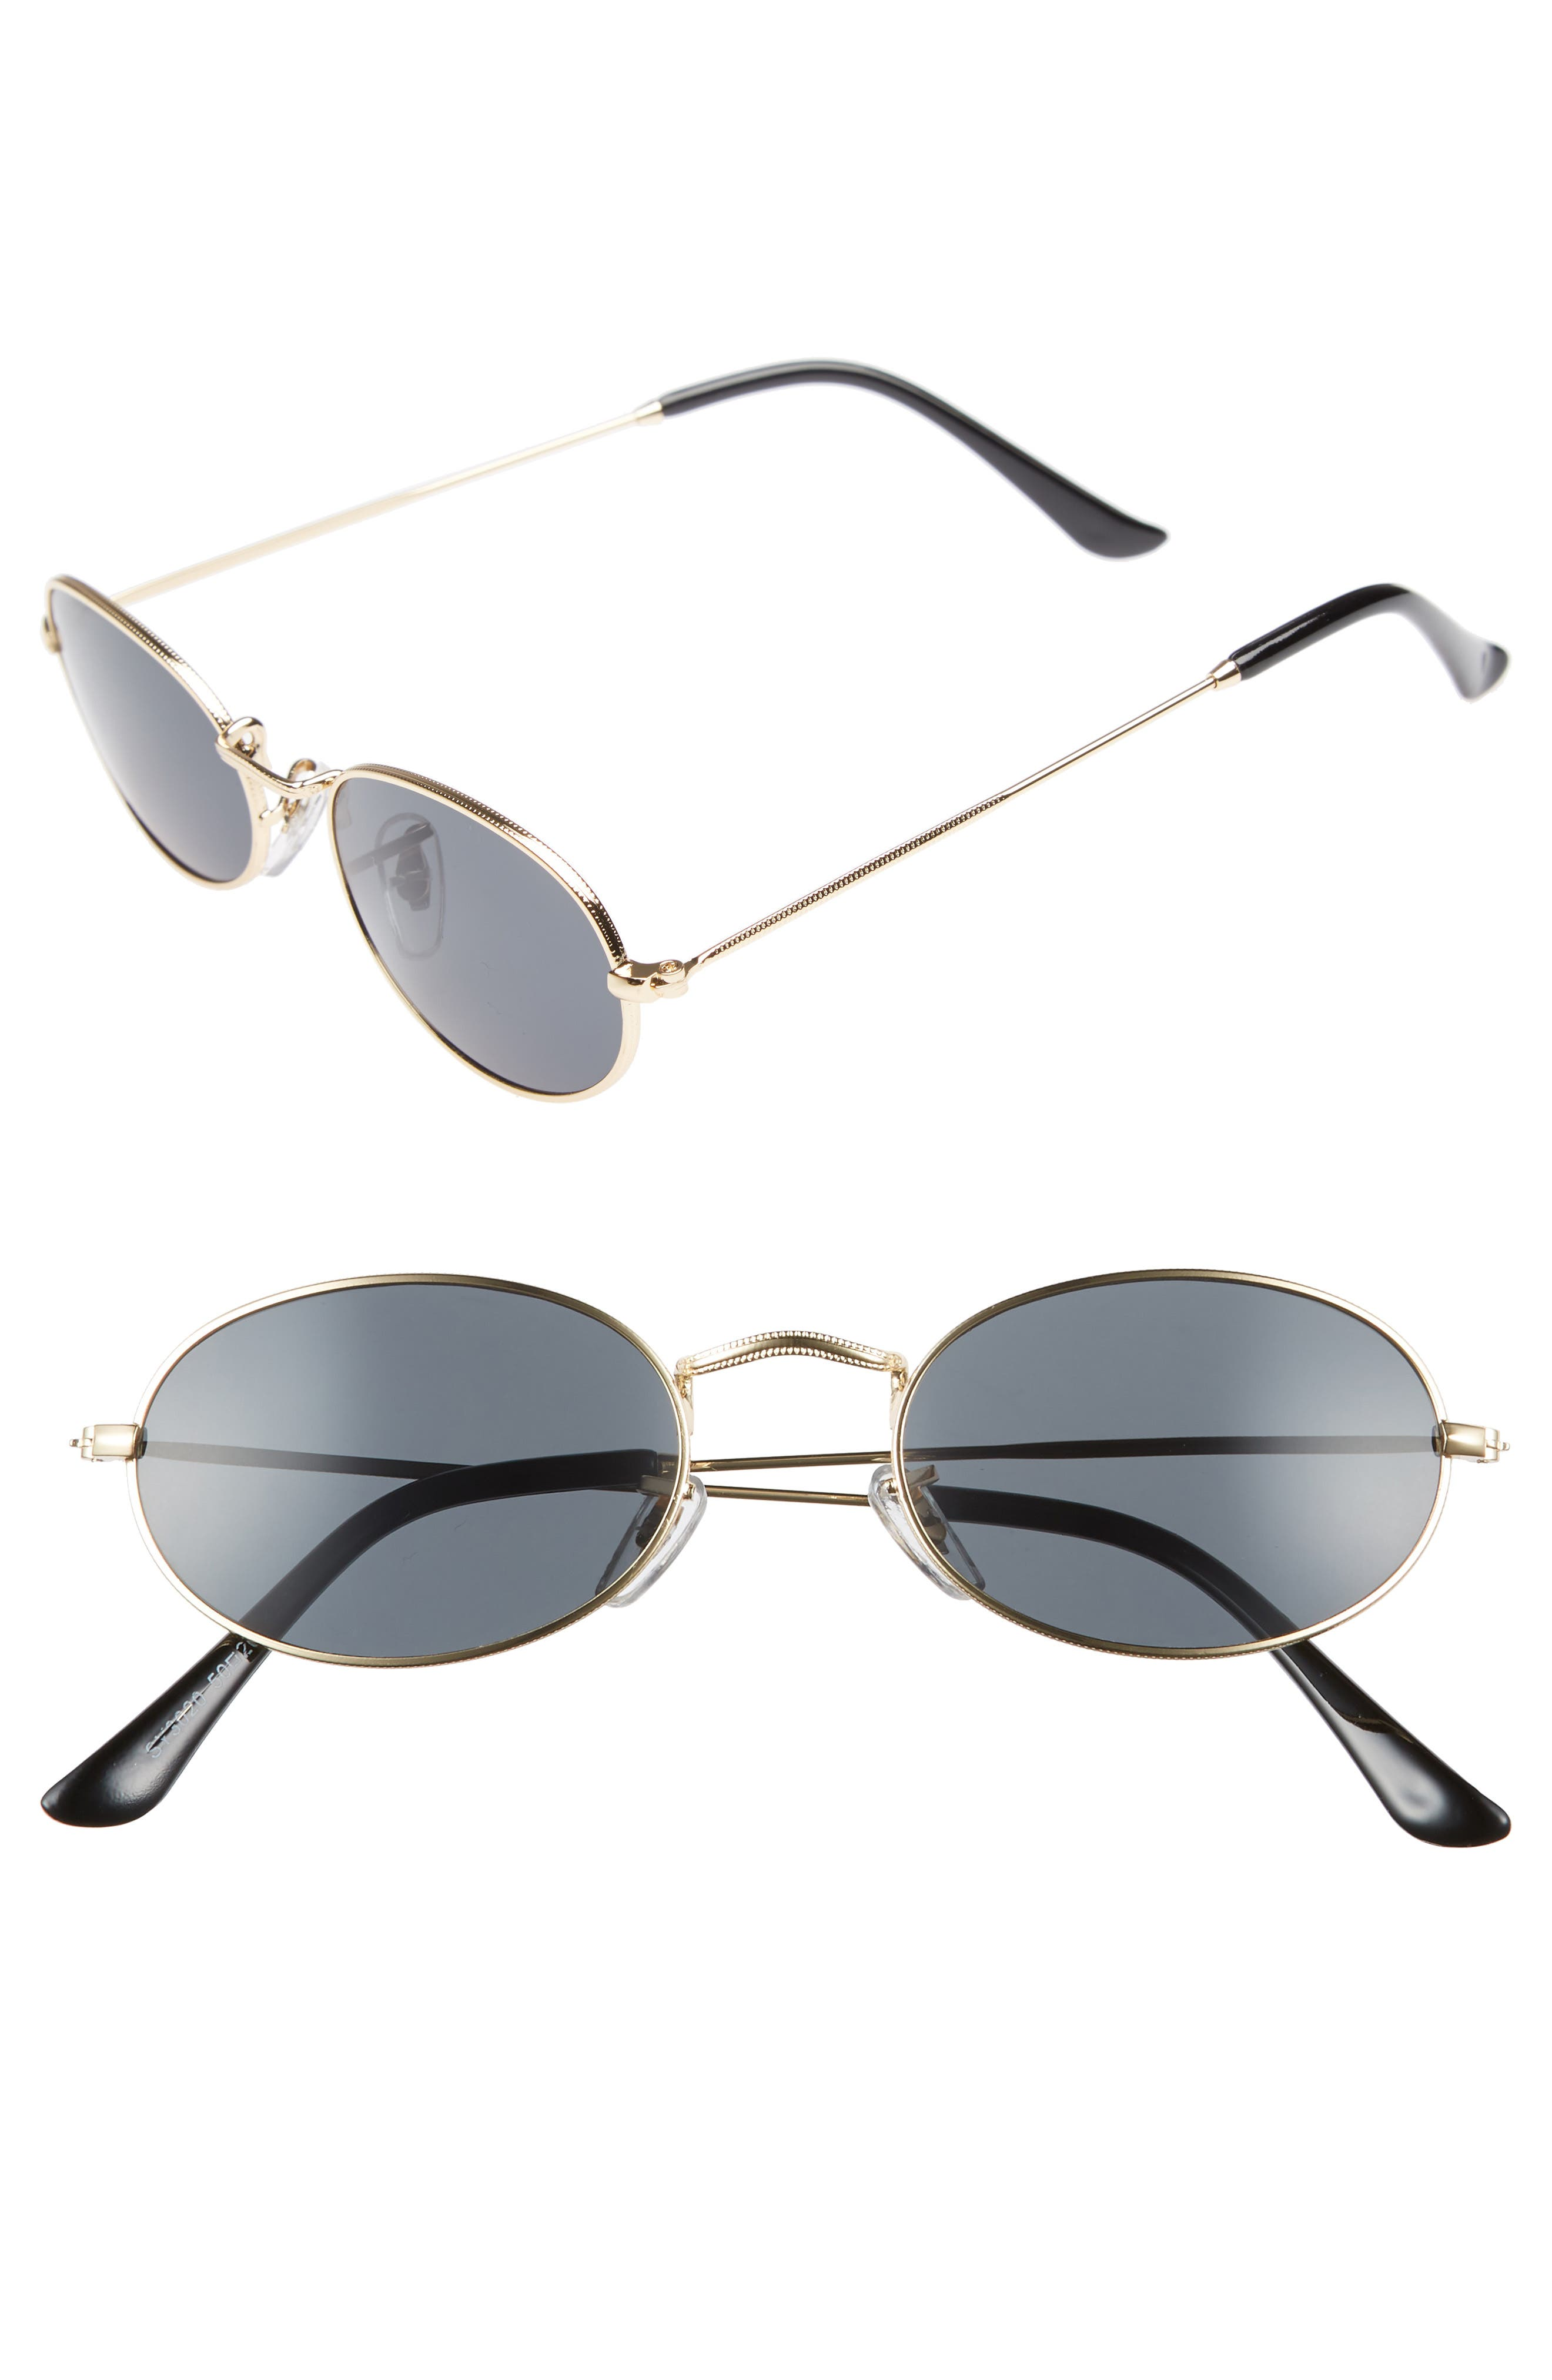 50mm Round Sunglasses,                             Main thumbnail 1, color,                             GOLD/ BLACK